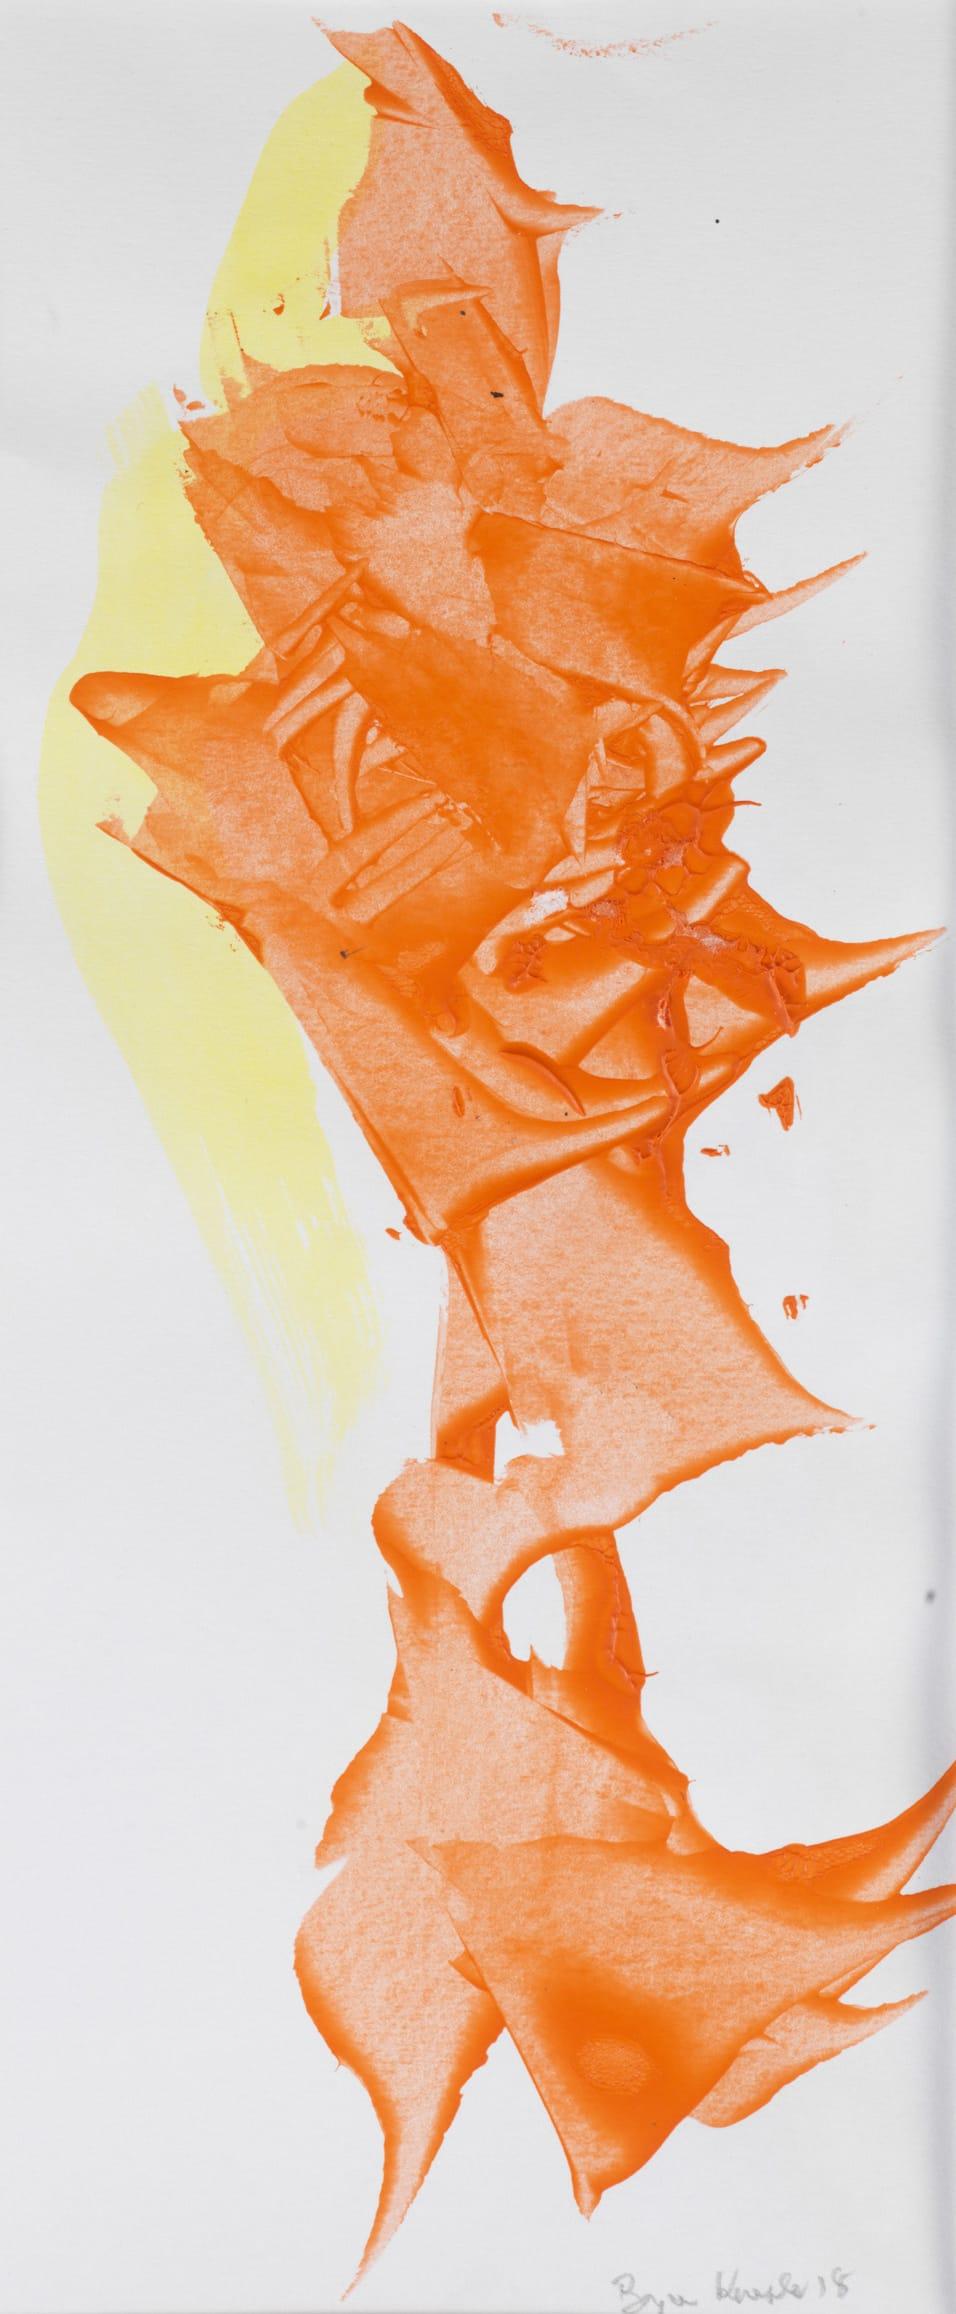 Bryan Kneale, Orange and Yellow, 2018